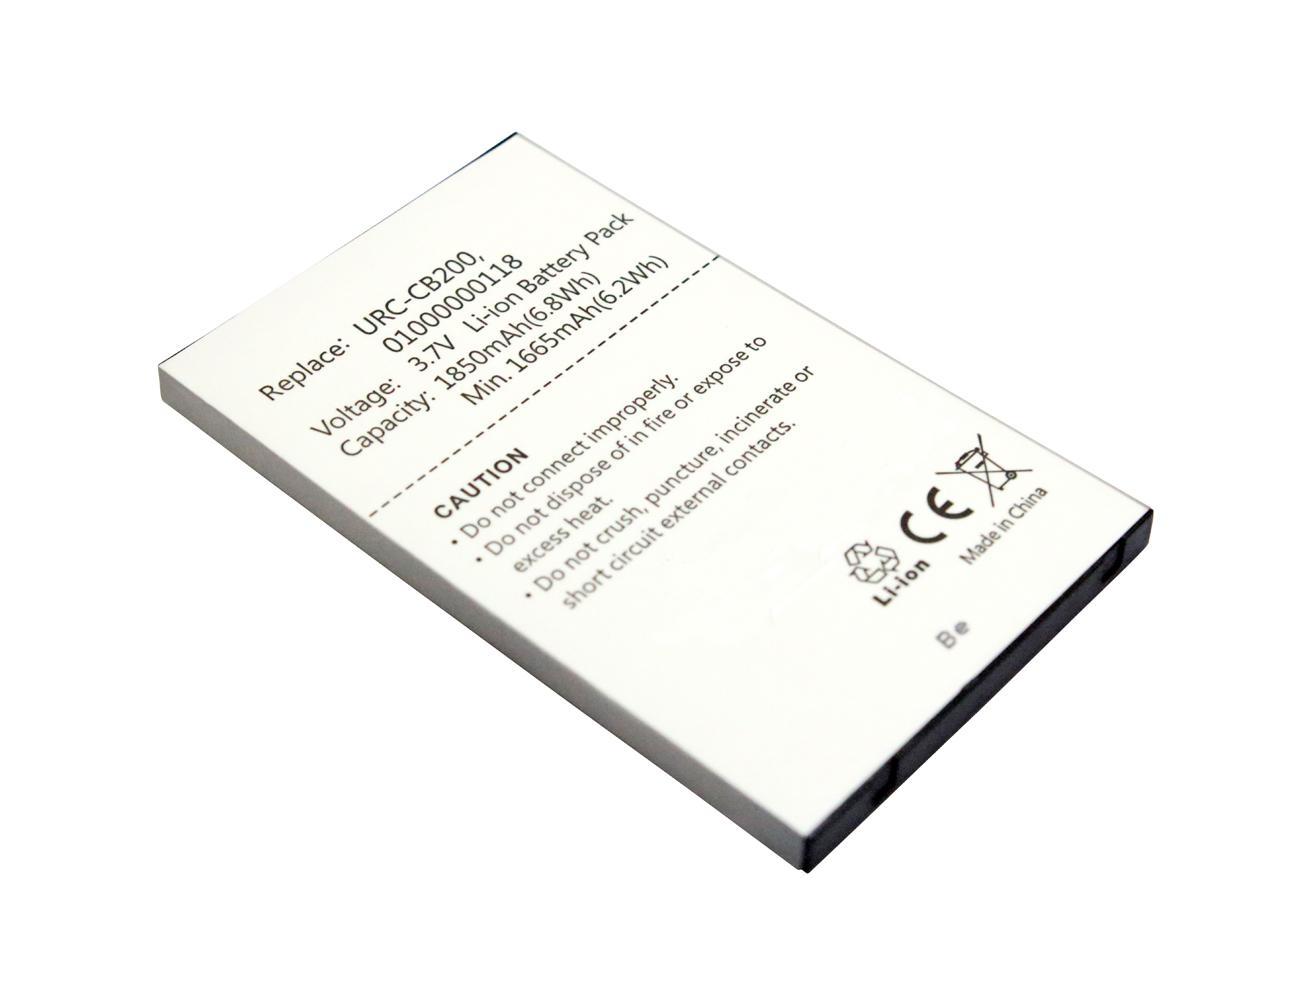 1850mah battery for sonos cb200 cb200wr1 cr200 sonos 200 controller cb200 cb200 ebay. Black Bedroom Furniture Sets. Home Design Ideas